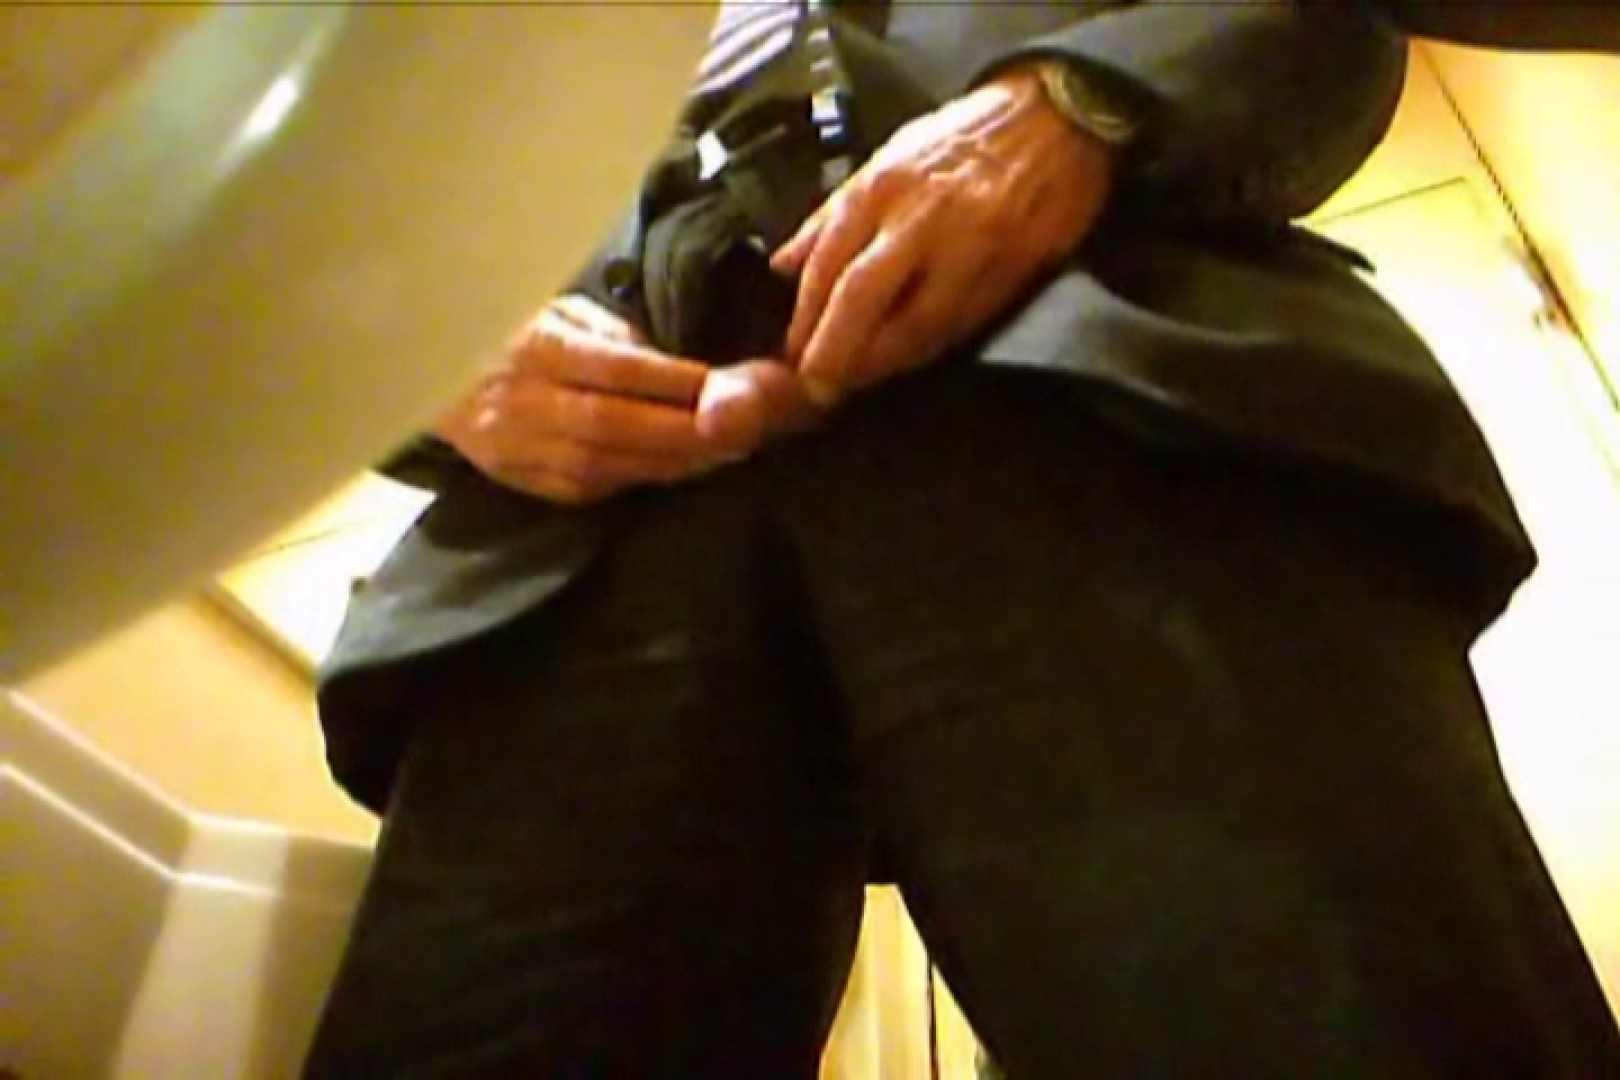 SEASON 2ND!掴み取りさんの洗面所覗き!in新幹線!VOL.01 リーマン系男子 ゲイエロ画像 105枚 19